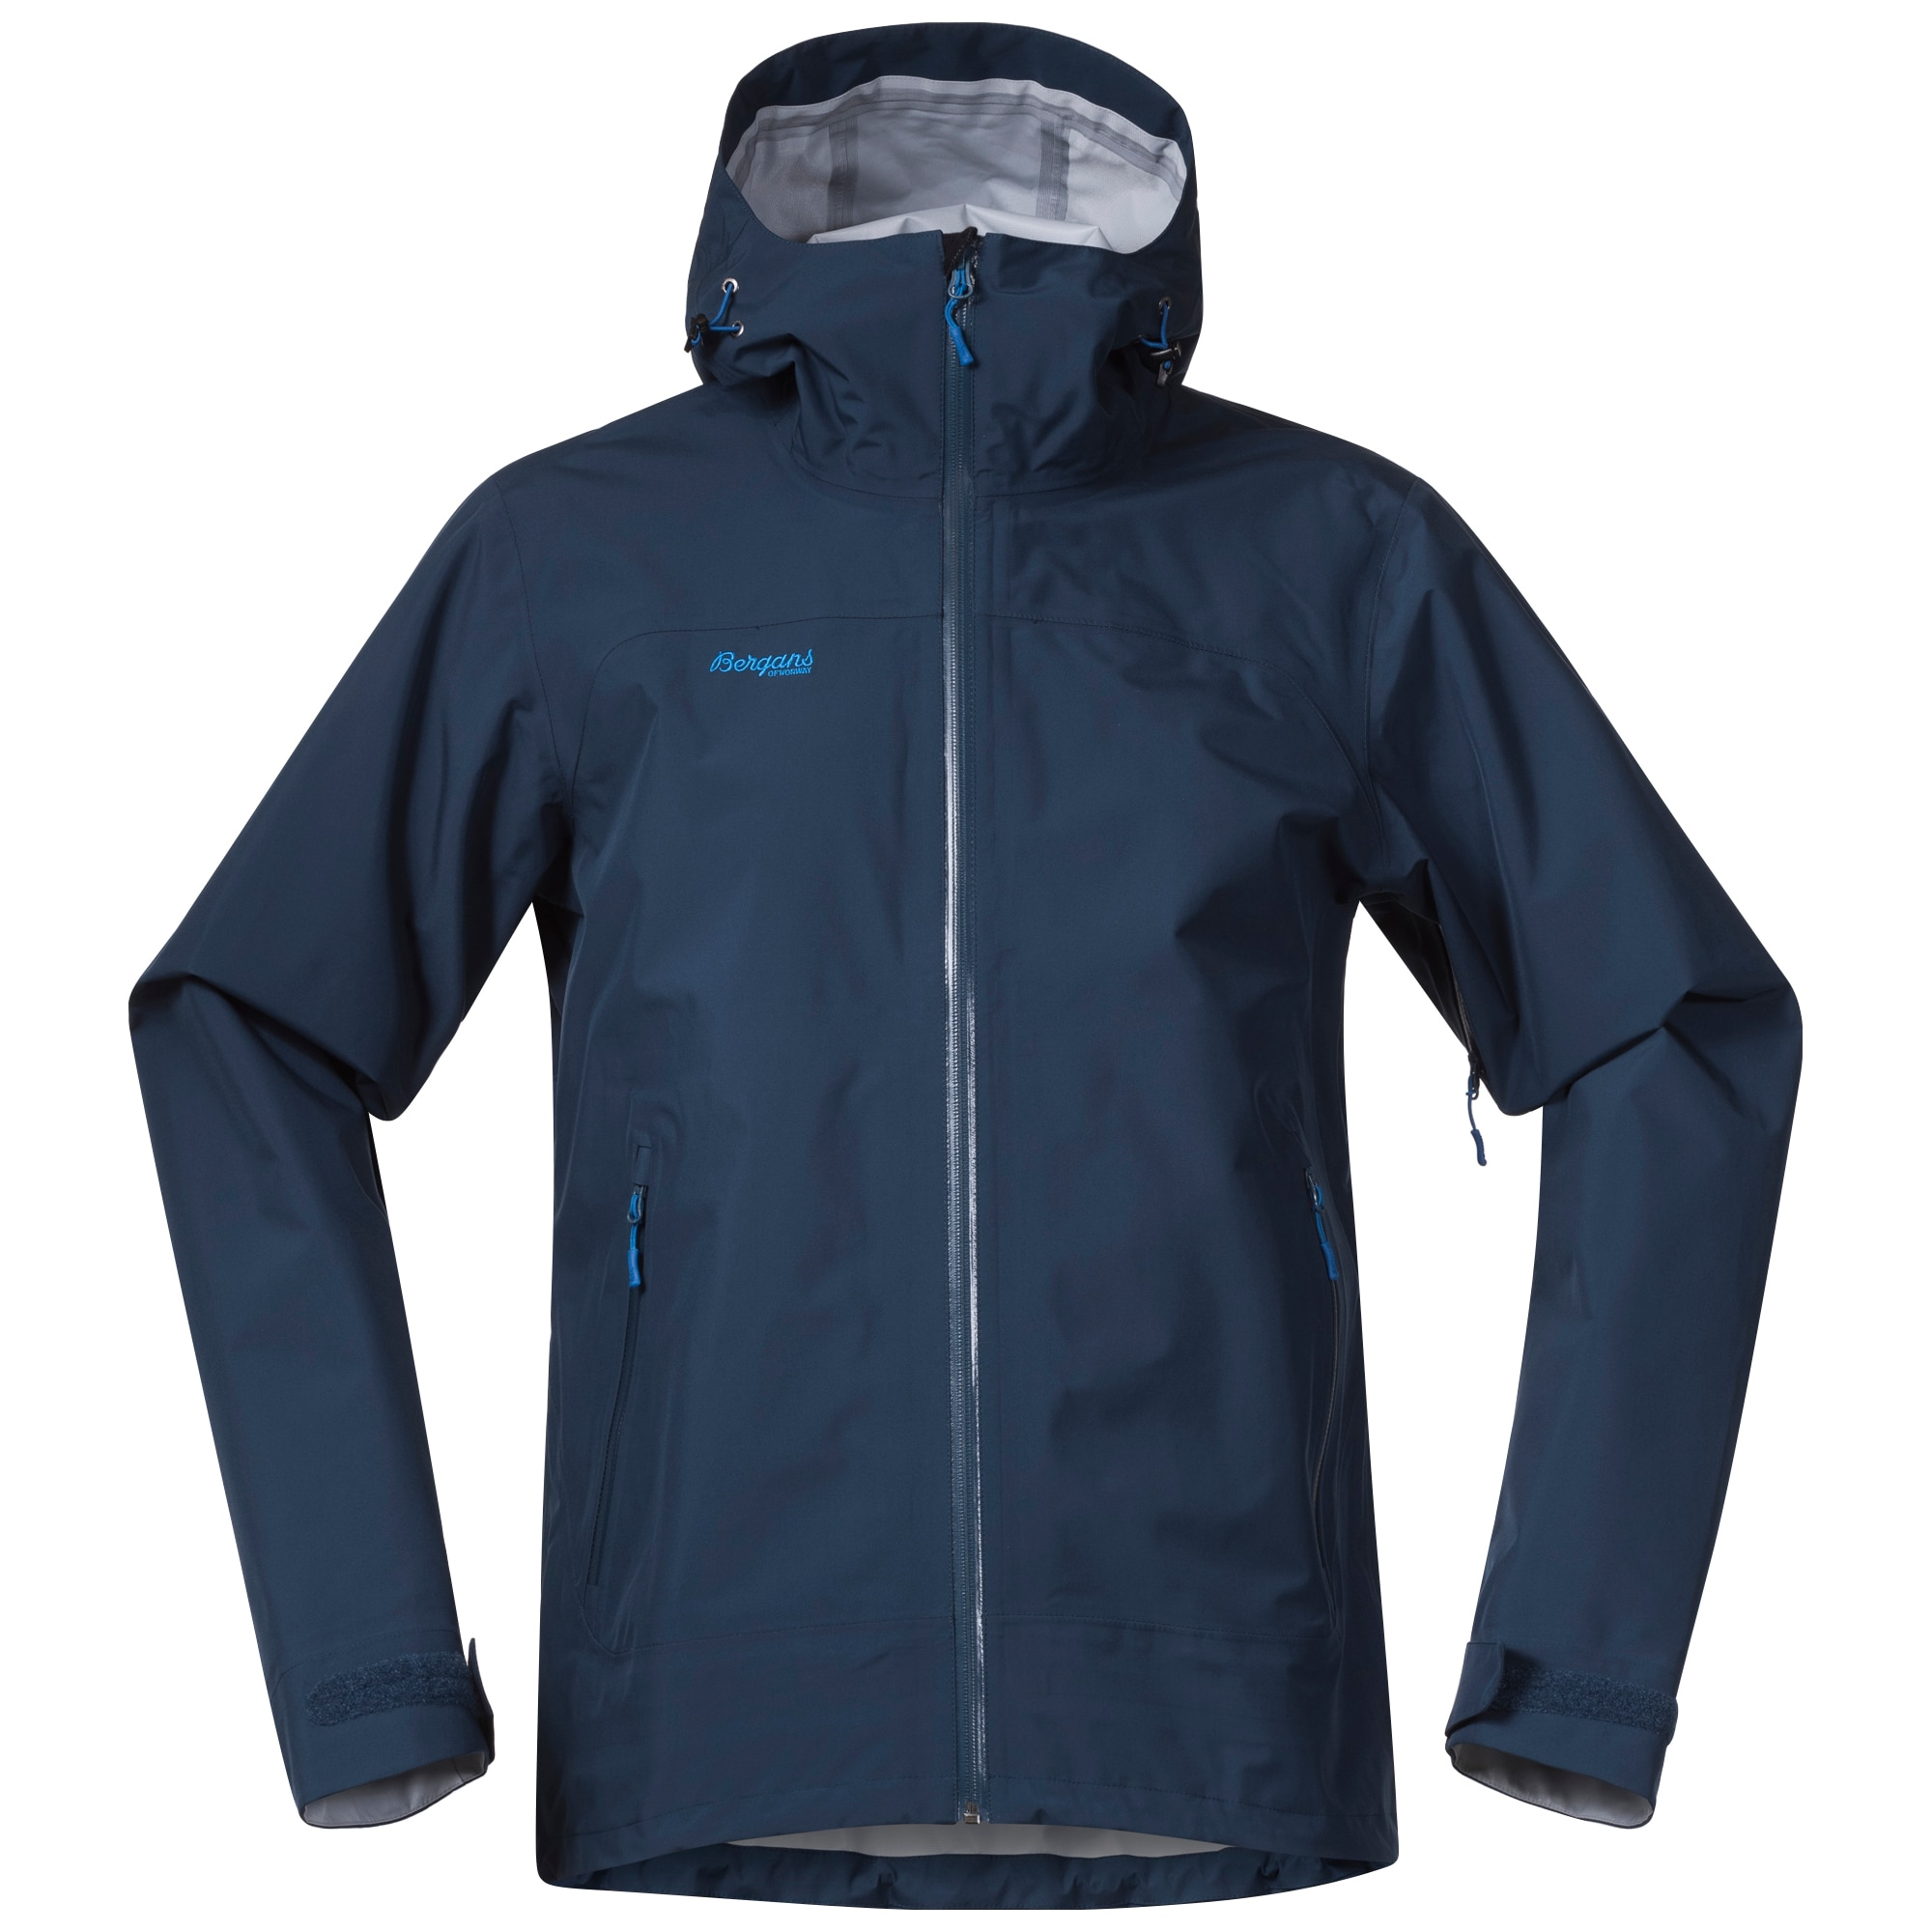 Ramberg 3-Layer Jacket